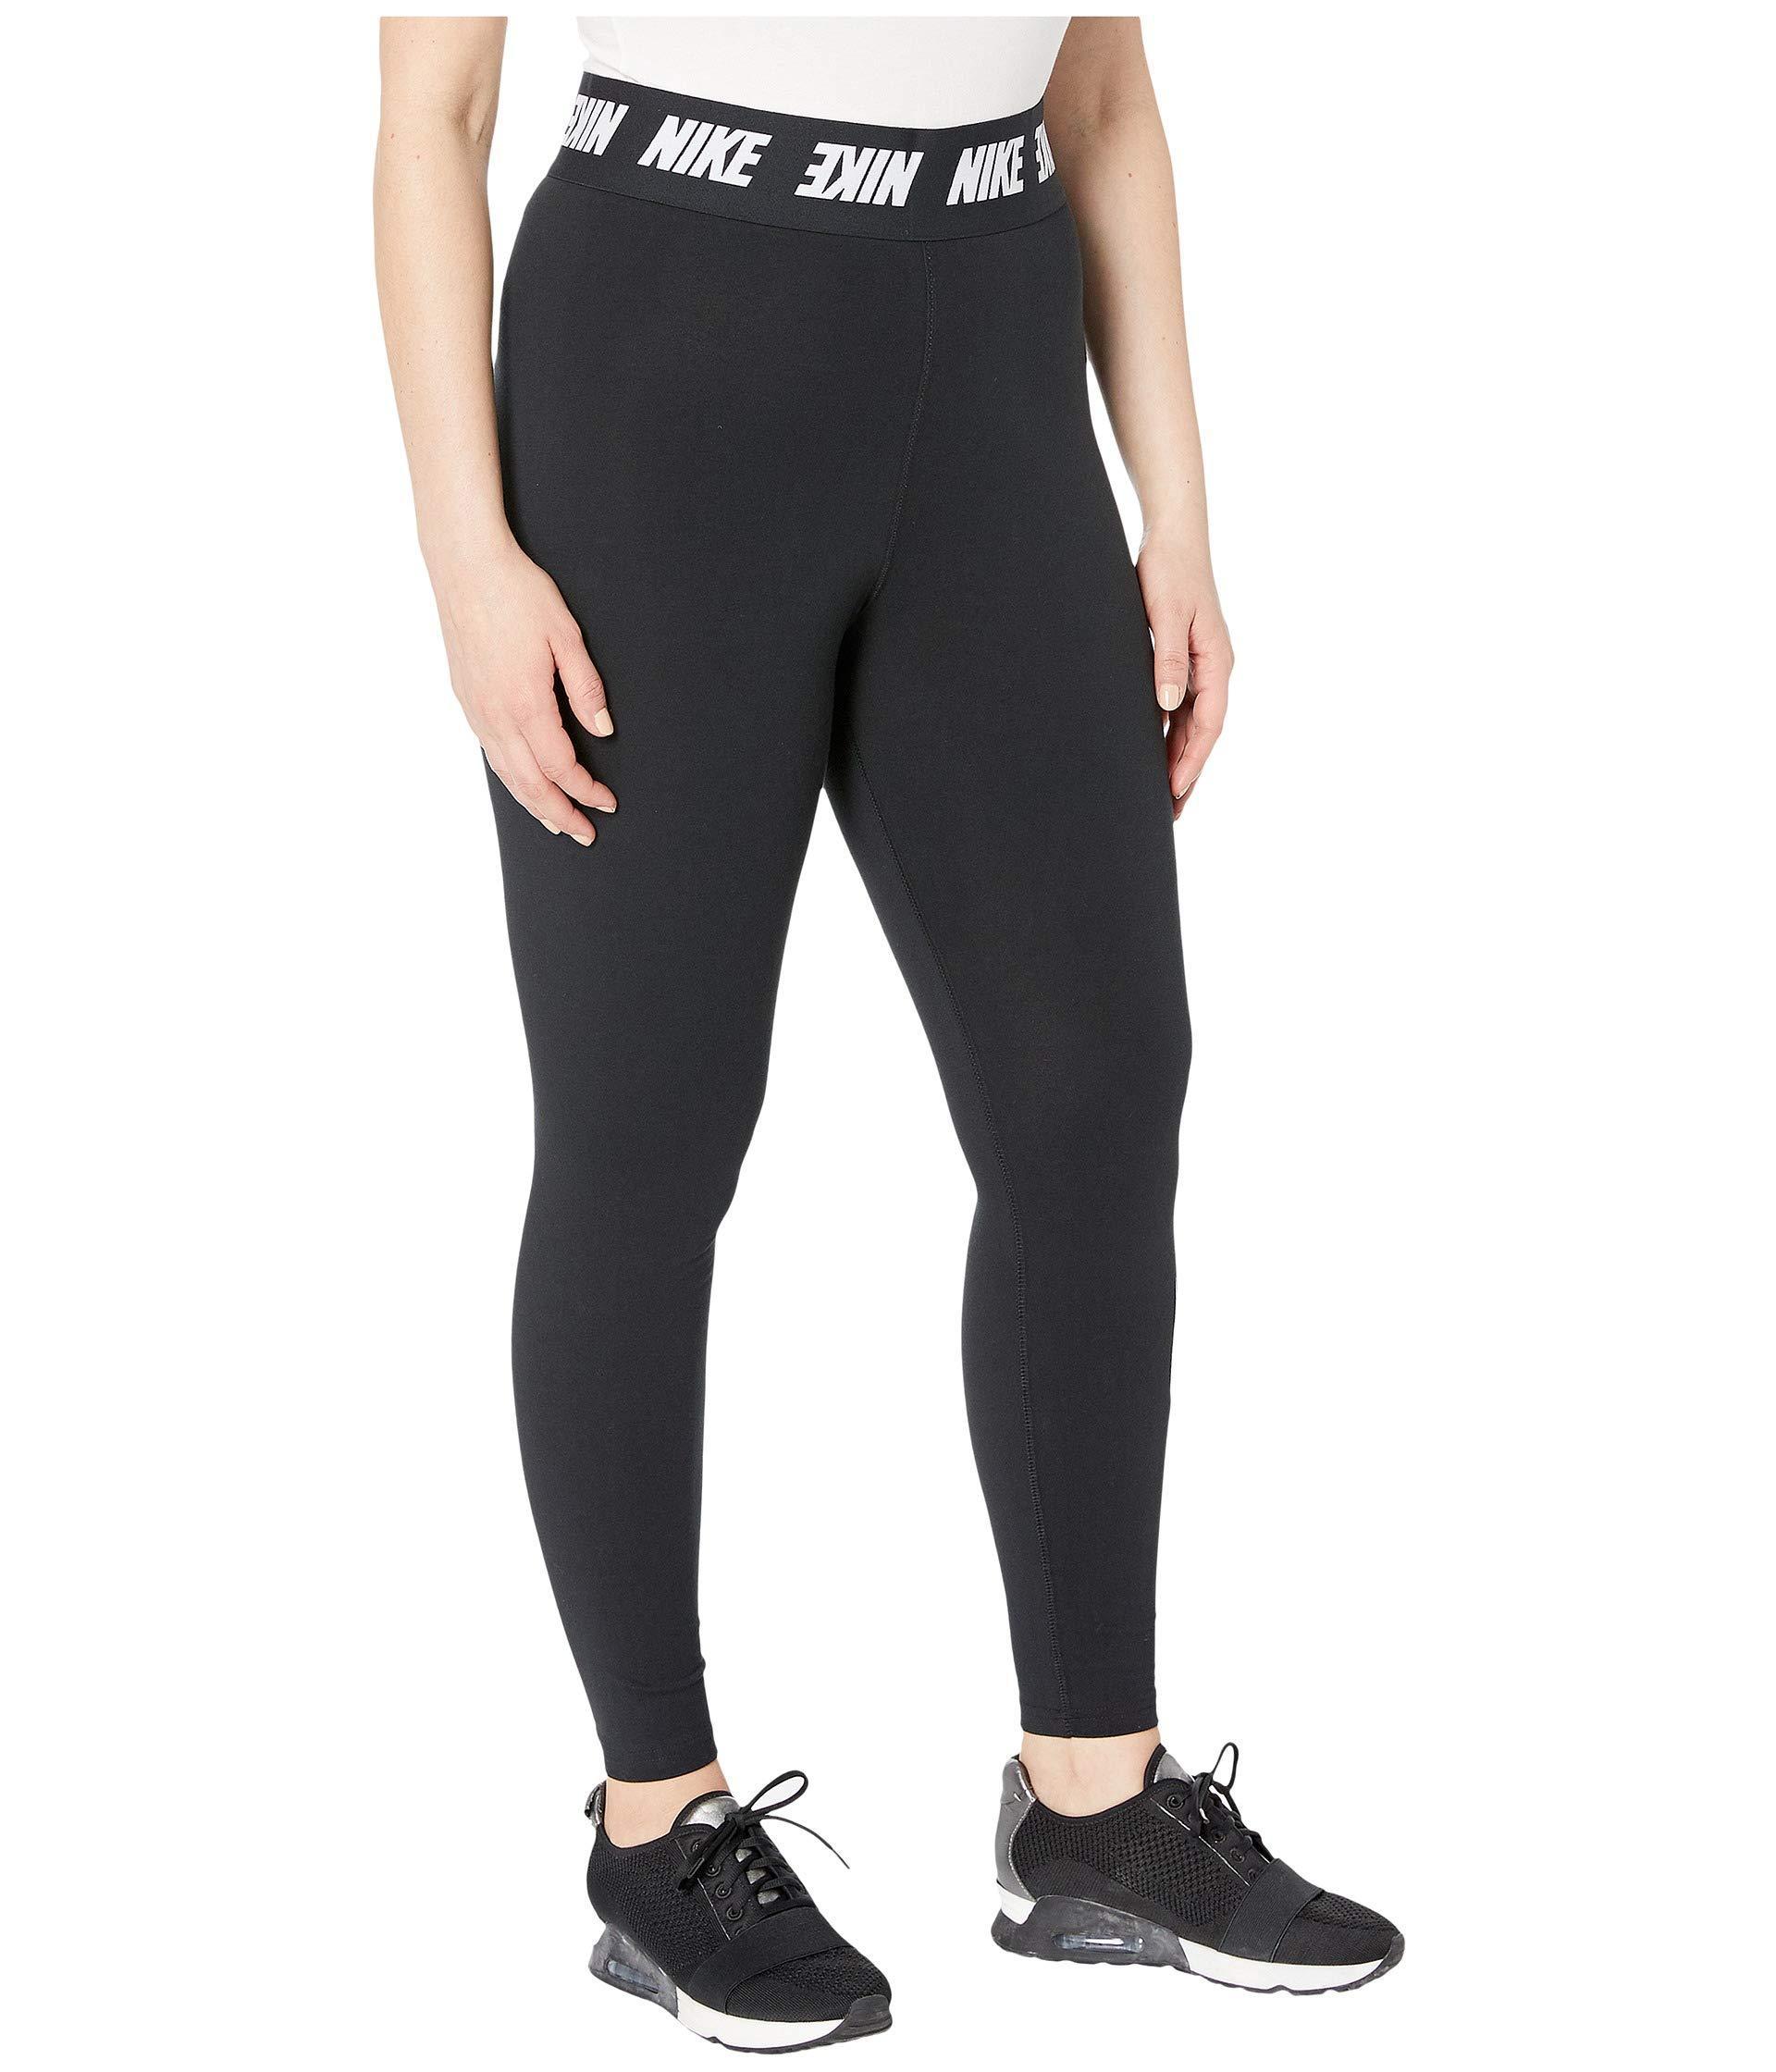 0ad72326 Nike Plus Size Sportswear Leggings Club High-waist (black/white) Women's  Casual Pants